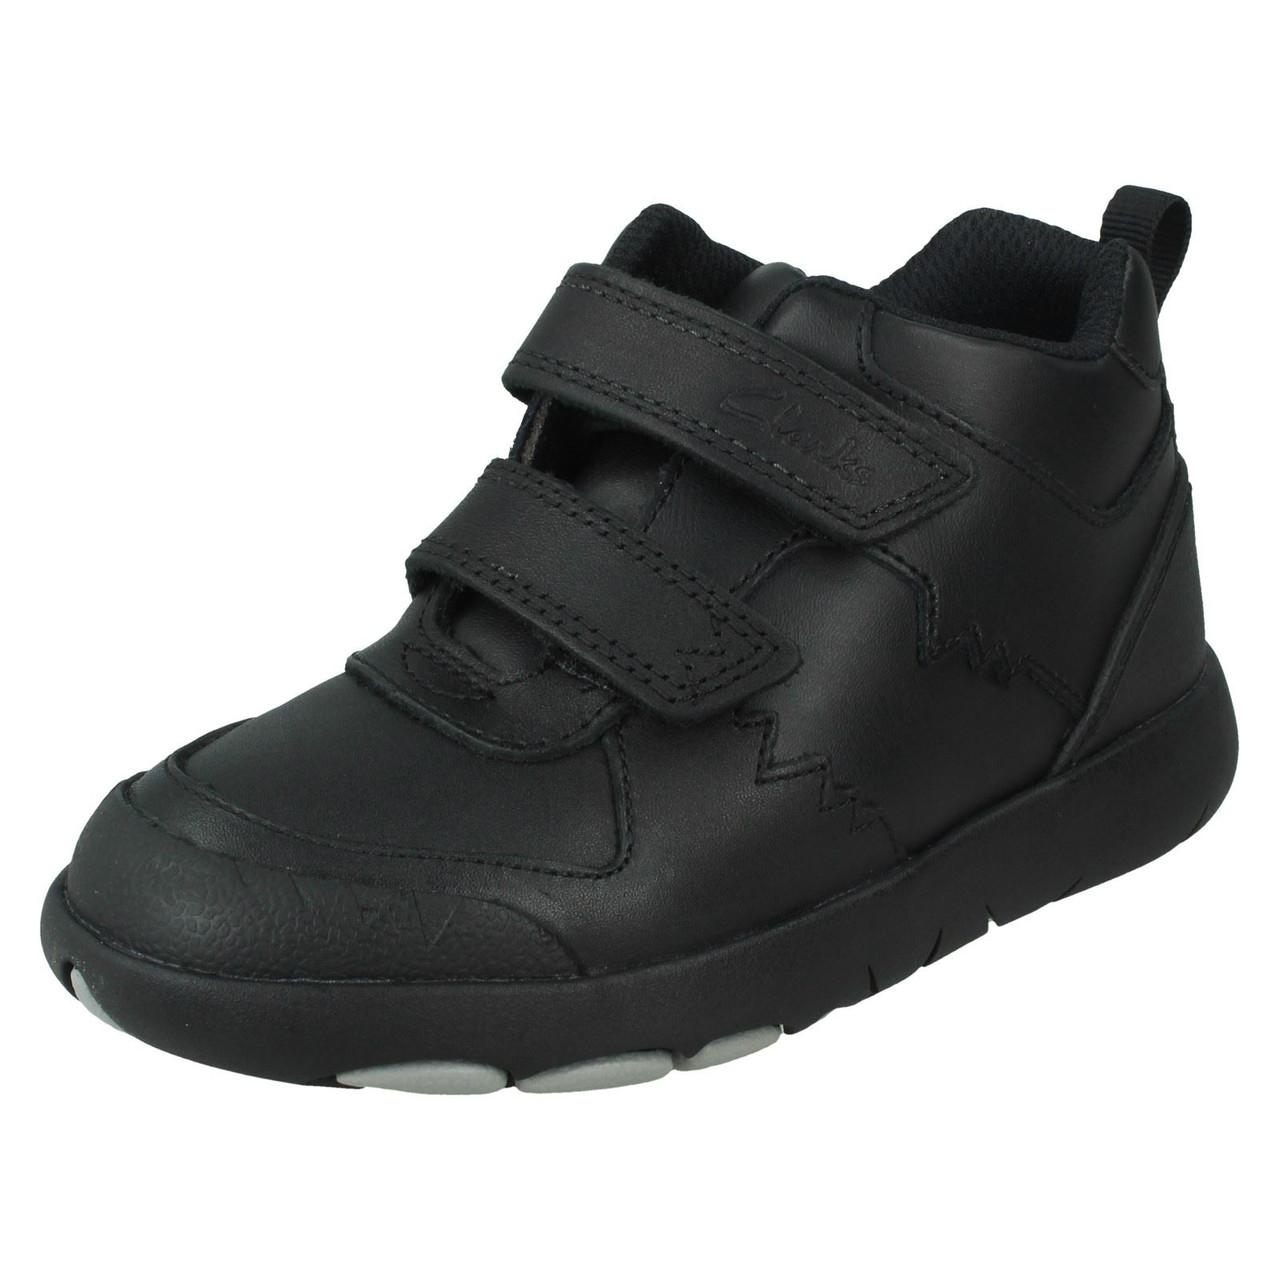 Boys Clarks Formal School Boots - Rex Crash